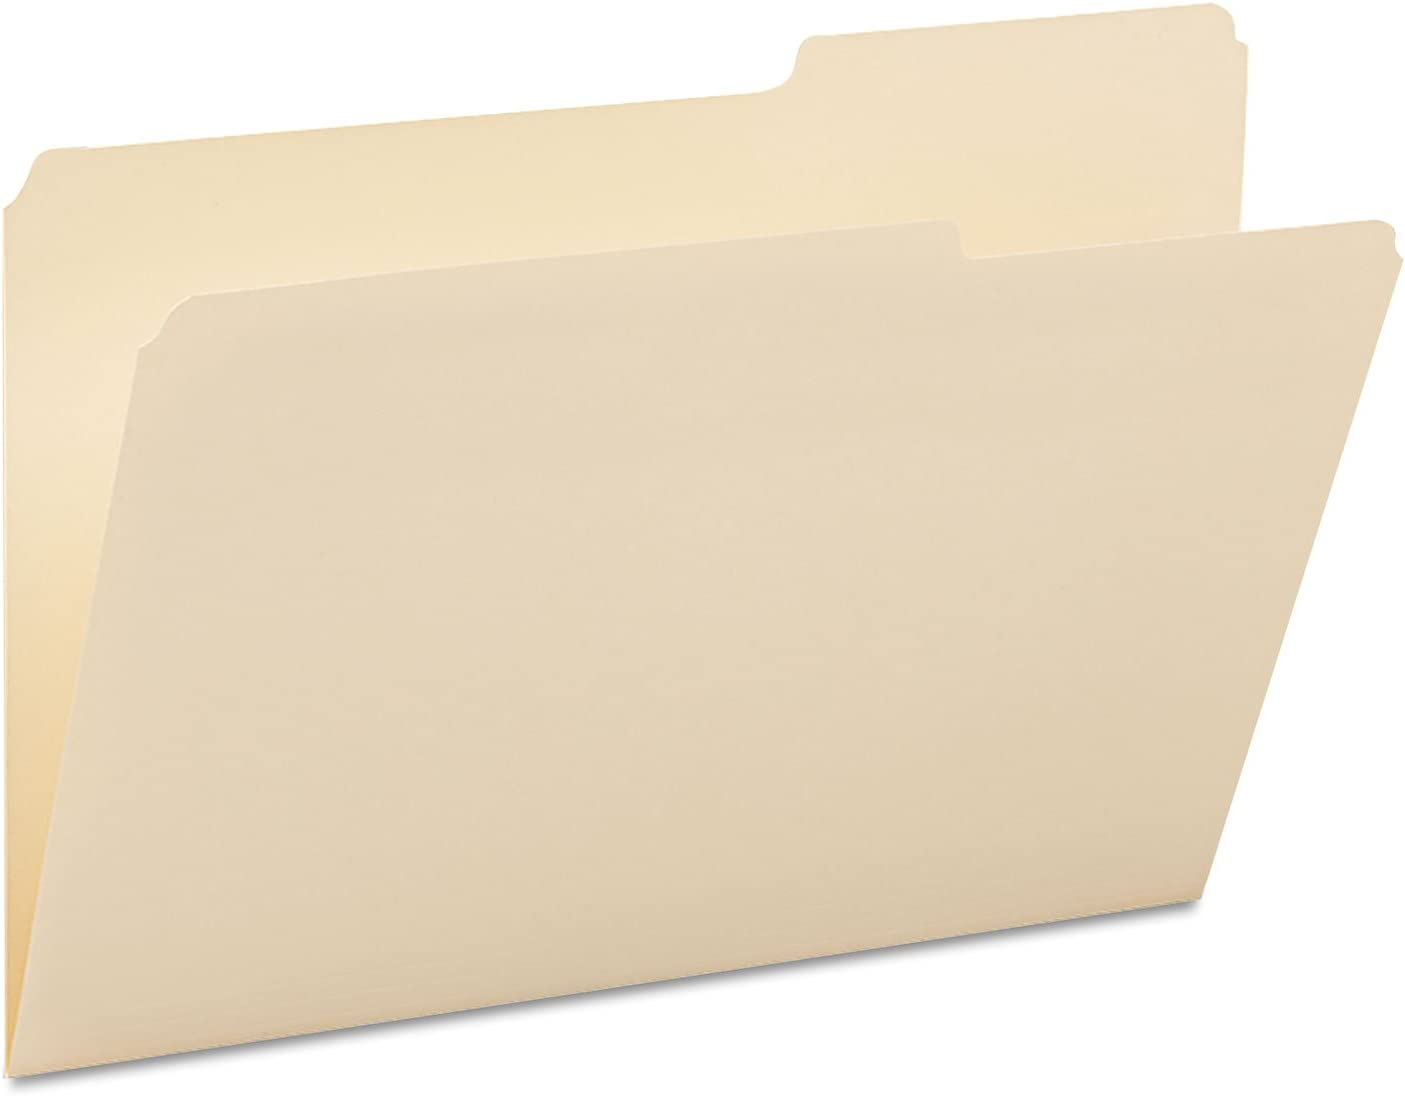 favorite Smead 15385 40% OFF Cheap Sale Guide Height File Folders 2 Lega Cut Tab Right 5 Top